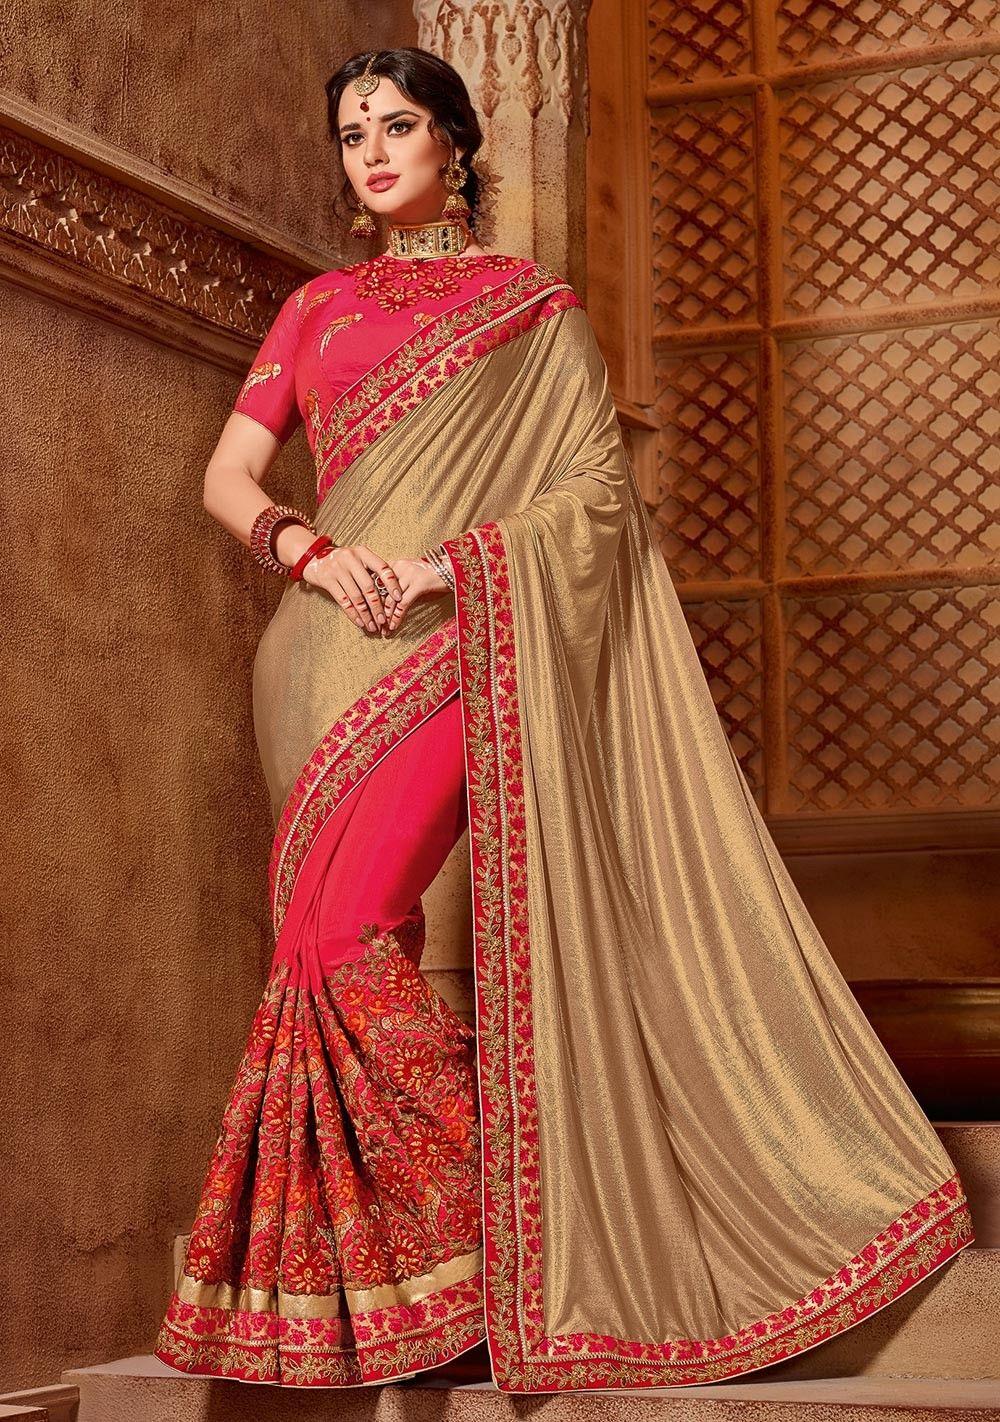 b9384121ba04a0 Gold Saree, Lycra, Two-tone Silk Saree, ₹4,710.00. Buy latest Saree with  custom stitching and worldwide shipping.